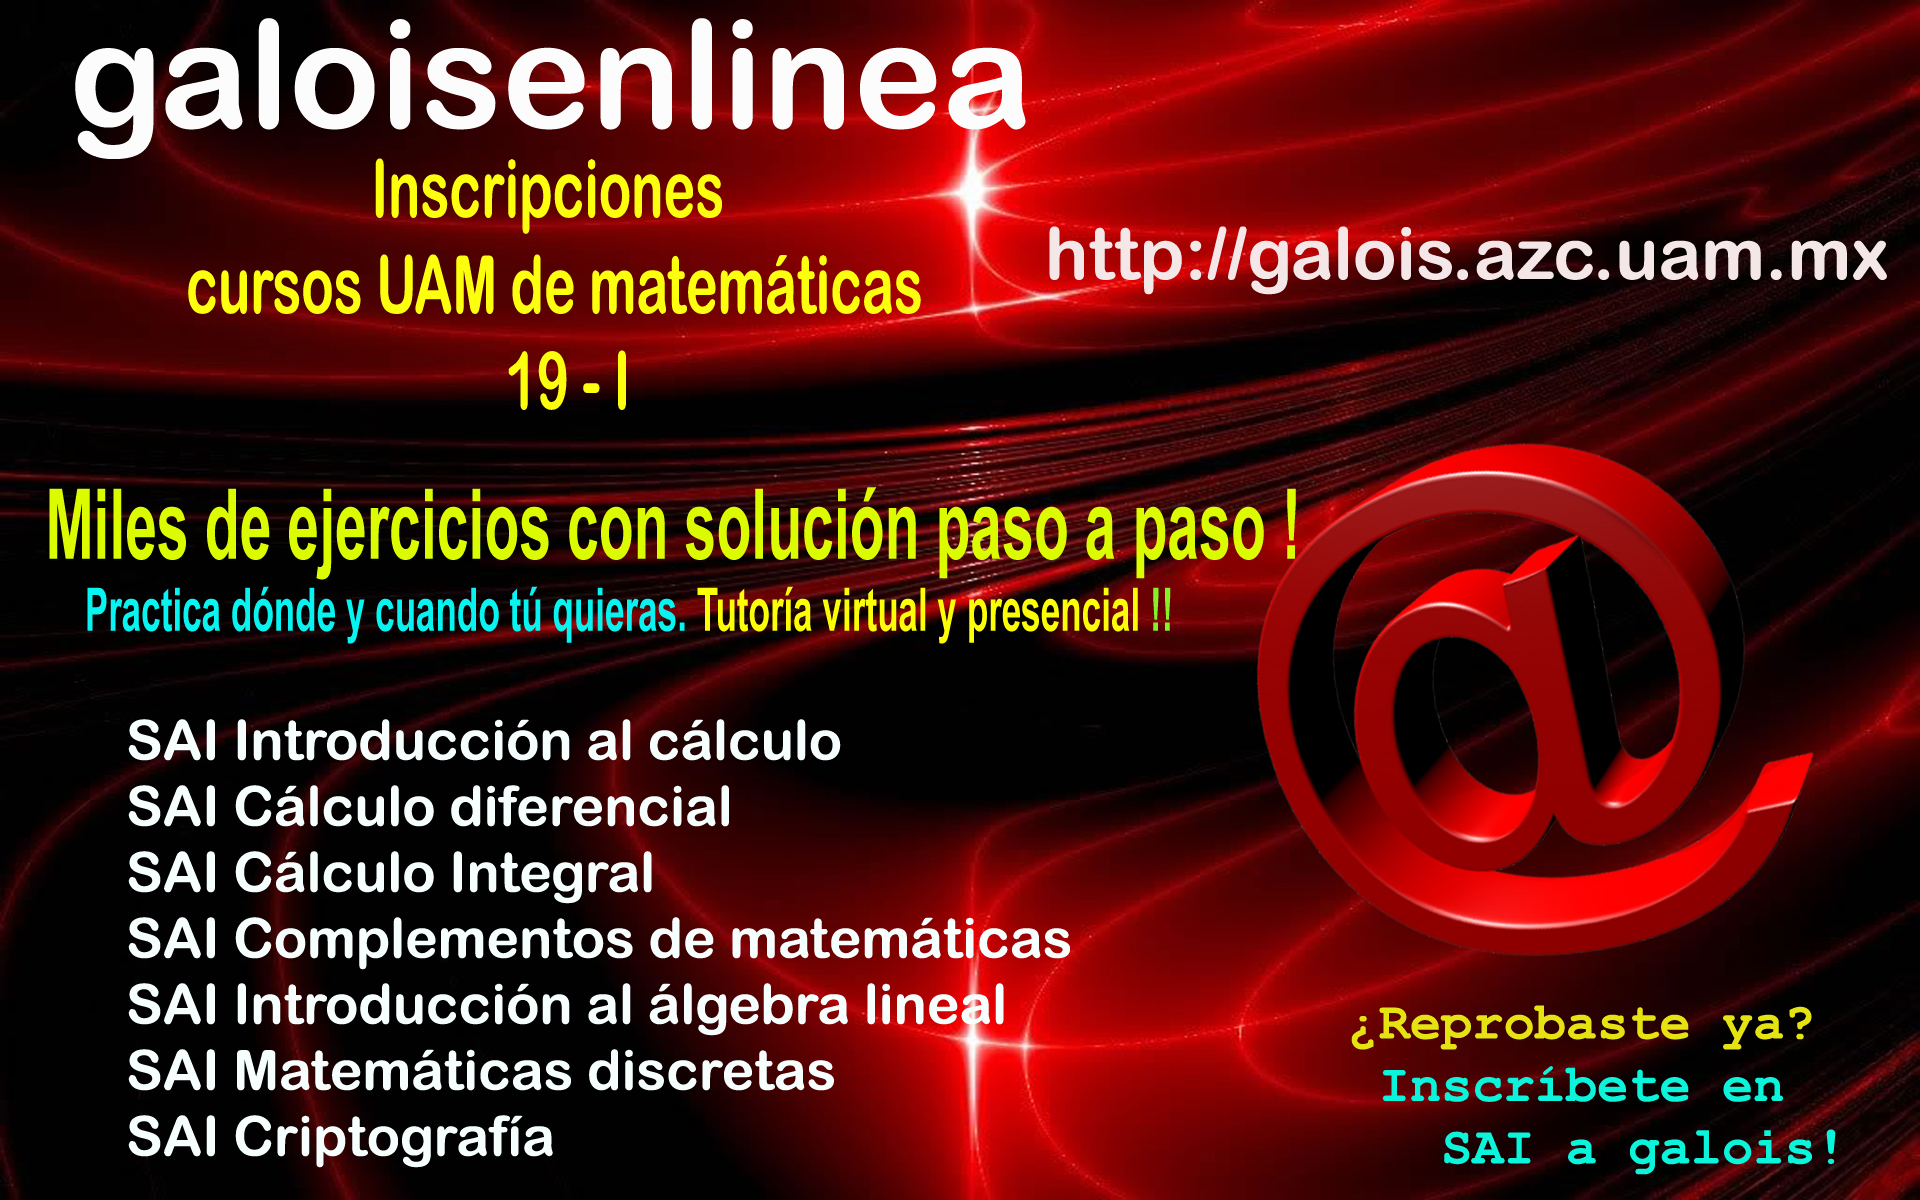 Cursos de Matemáticas